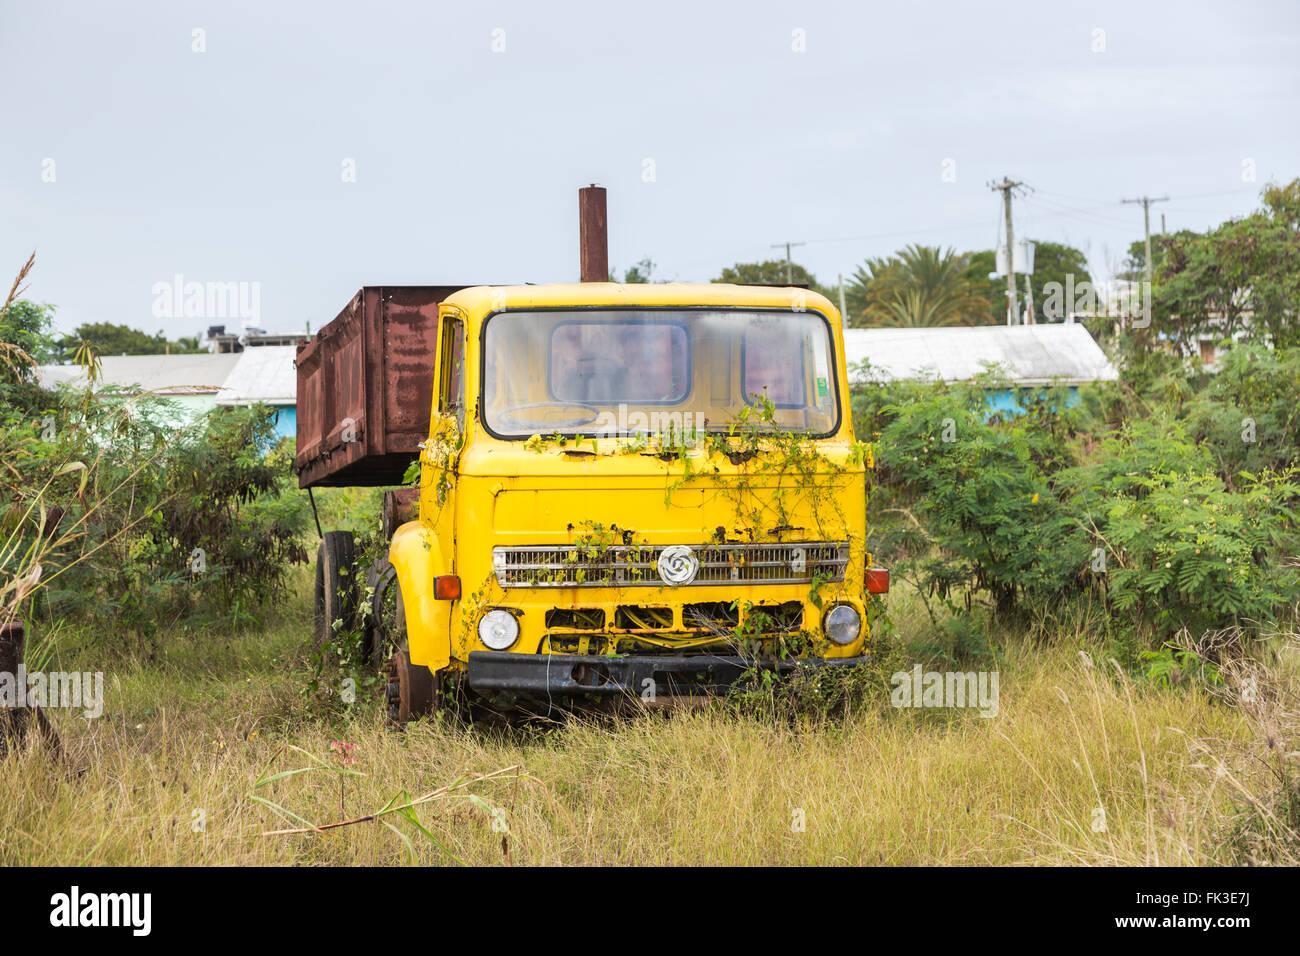 Overgrown, rusting yellow Leyland tipper truck in Ogg Spencer's Trucking scrapyard, Liberta, south Antigua, - Stock Image